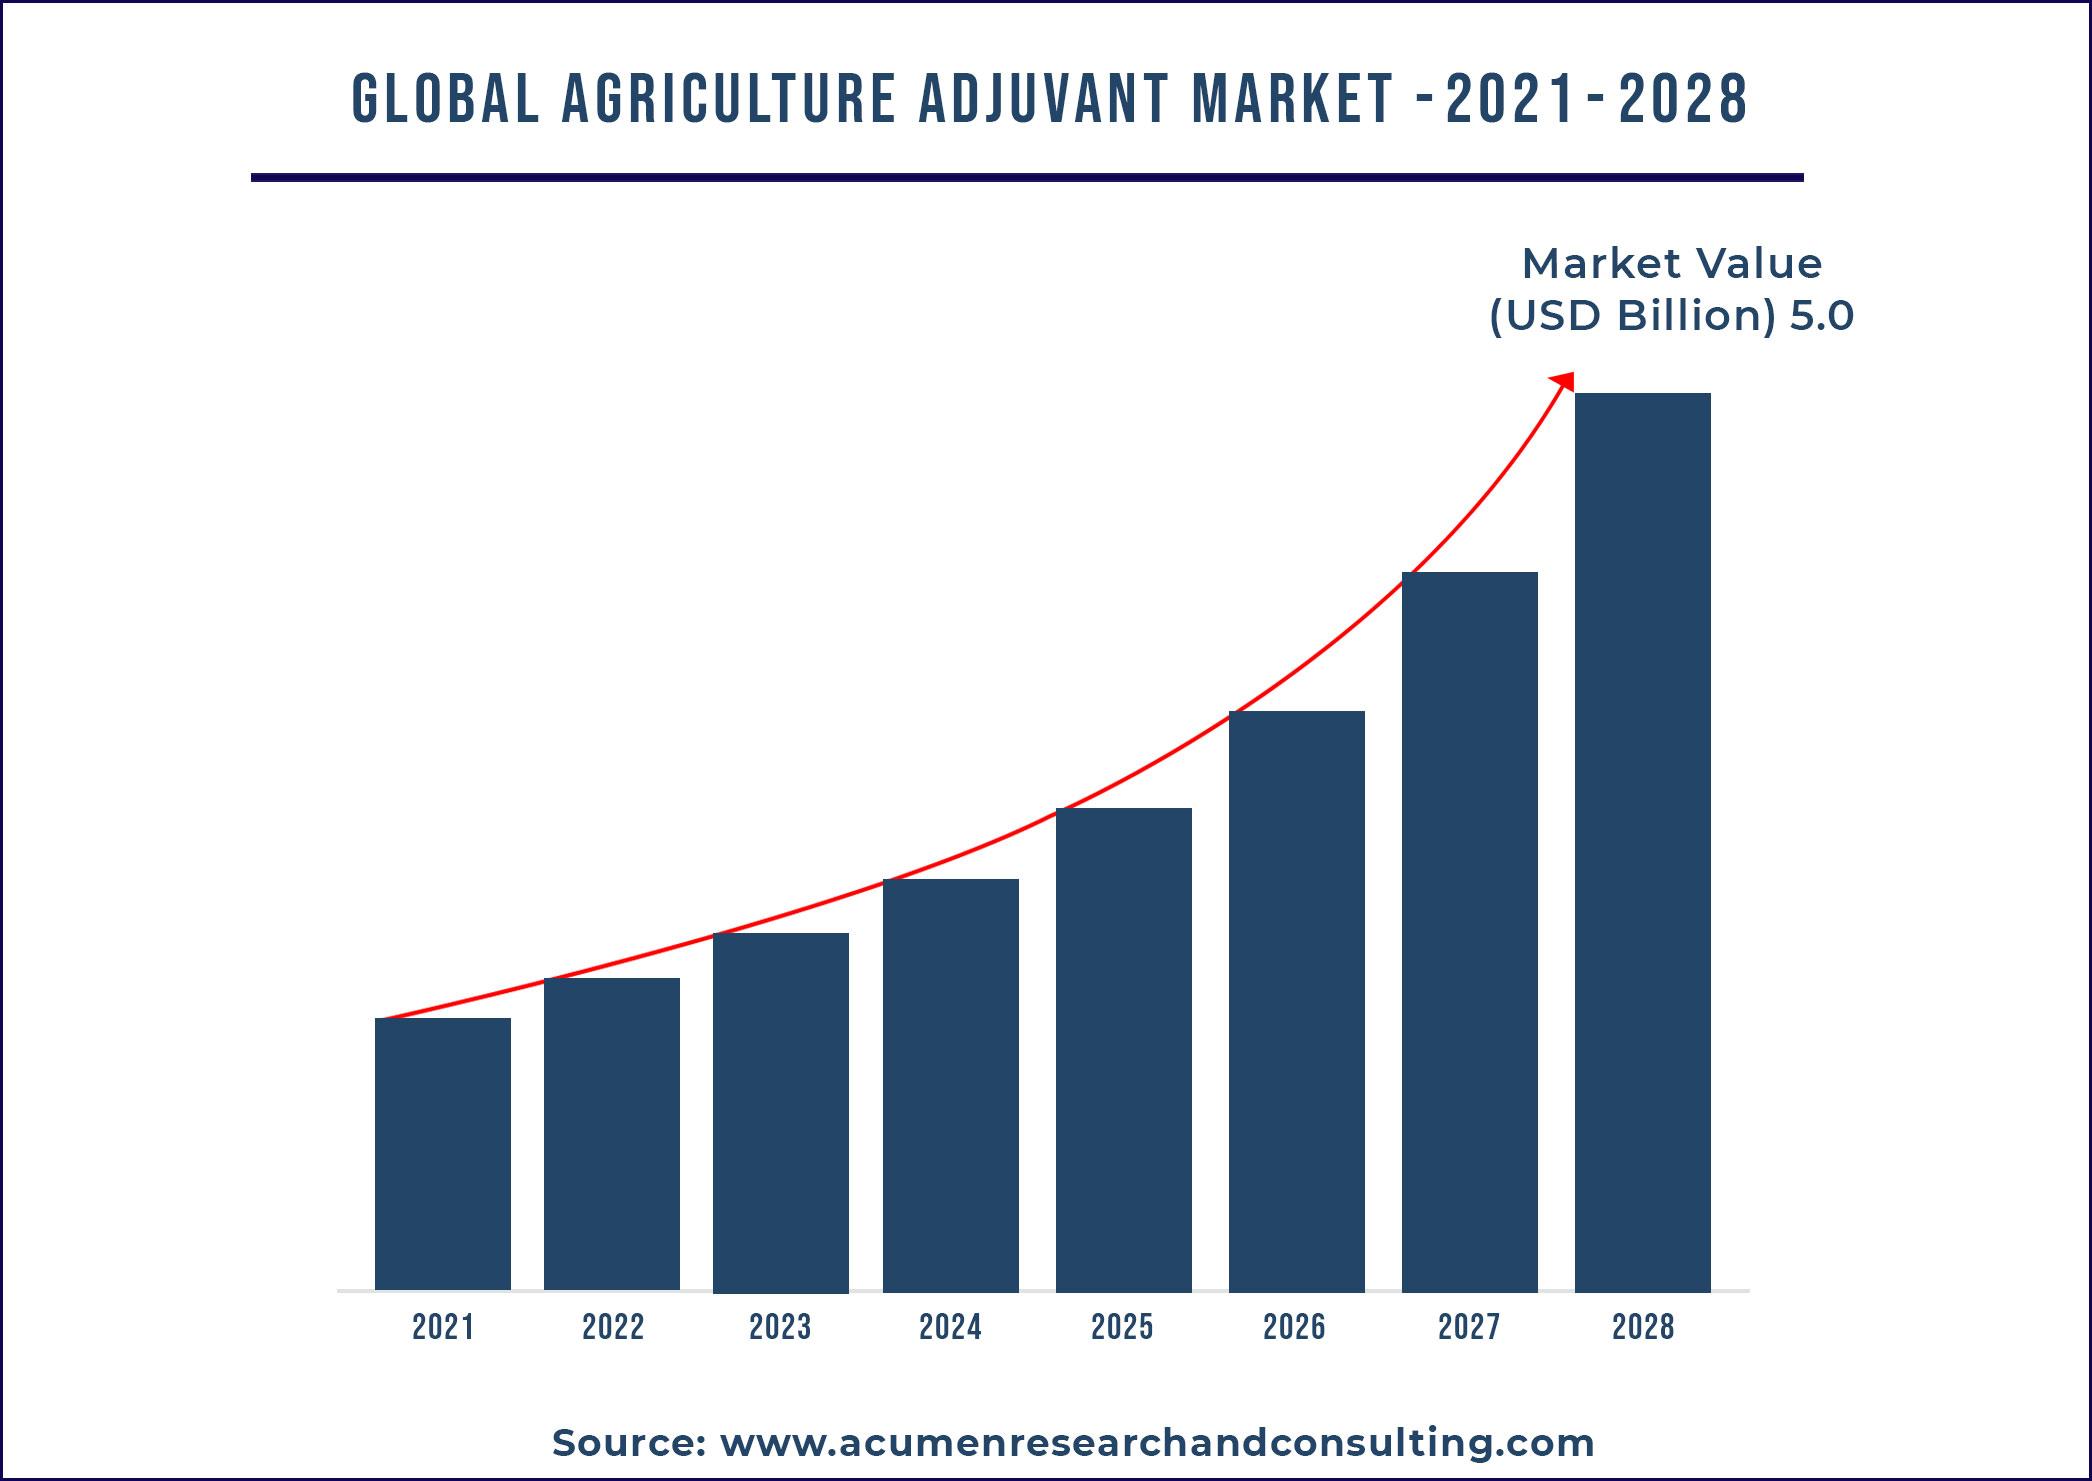 Agriculture Adjuvant Market